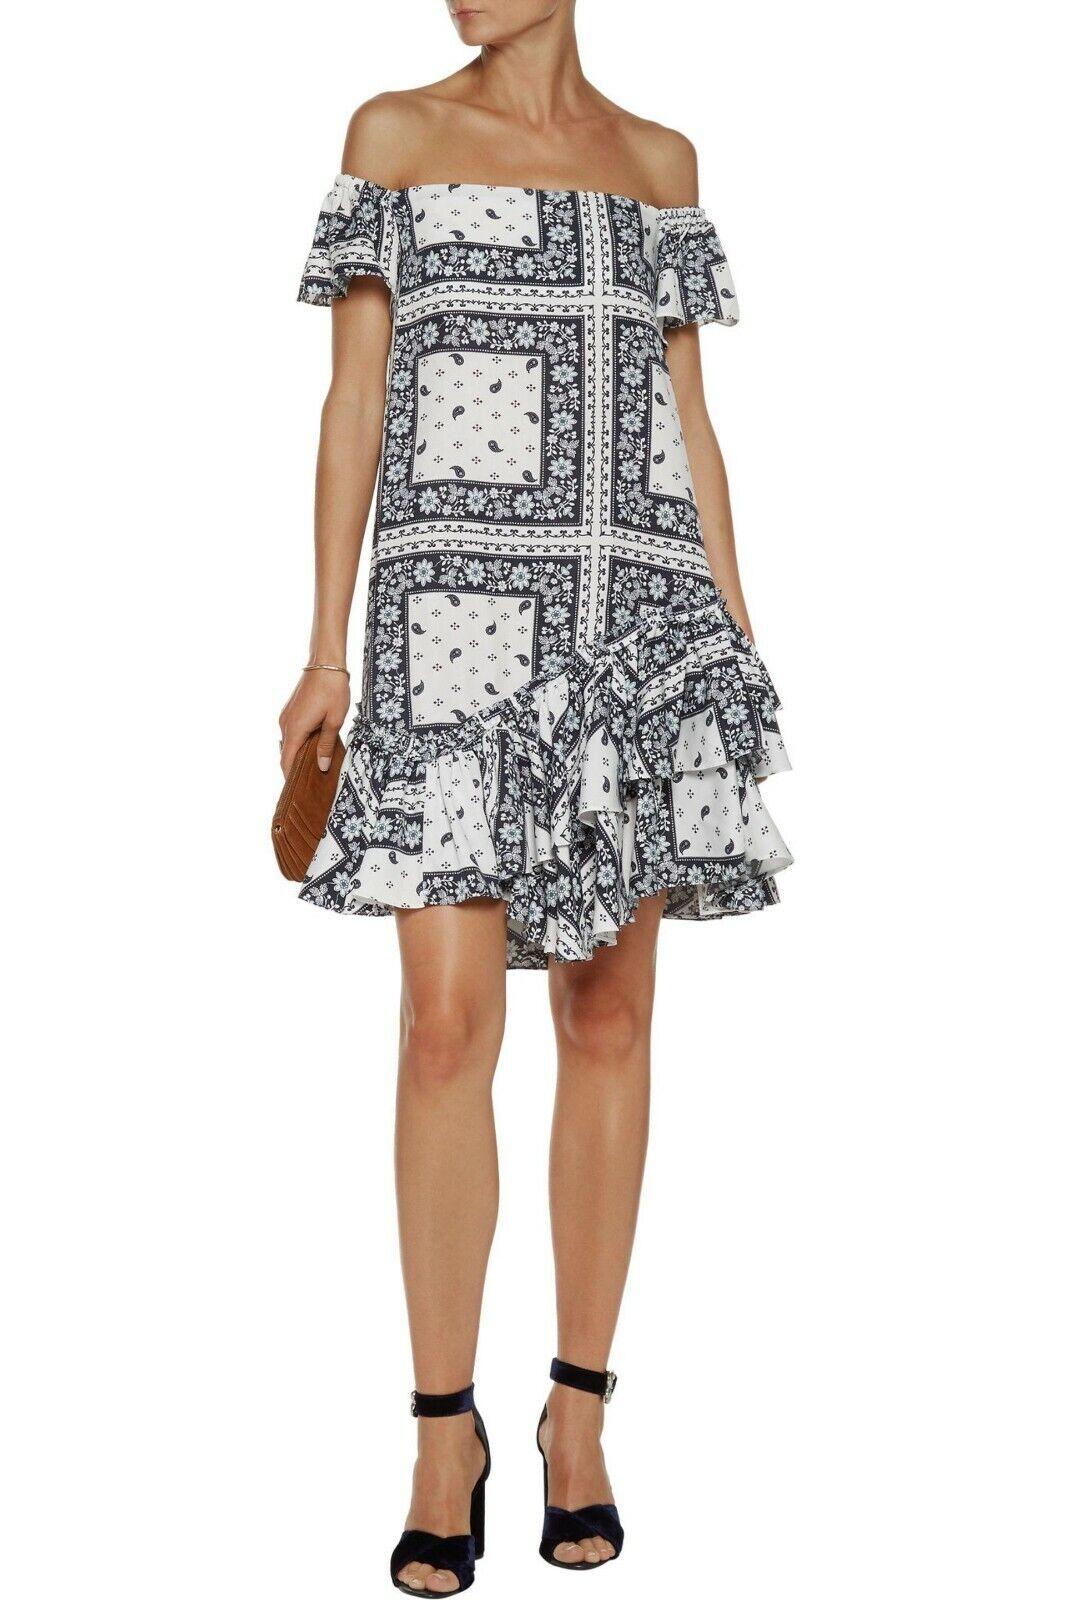 NWOT   Cinq a Sept Minella Off-The-Shoulder Dress 10